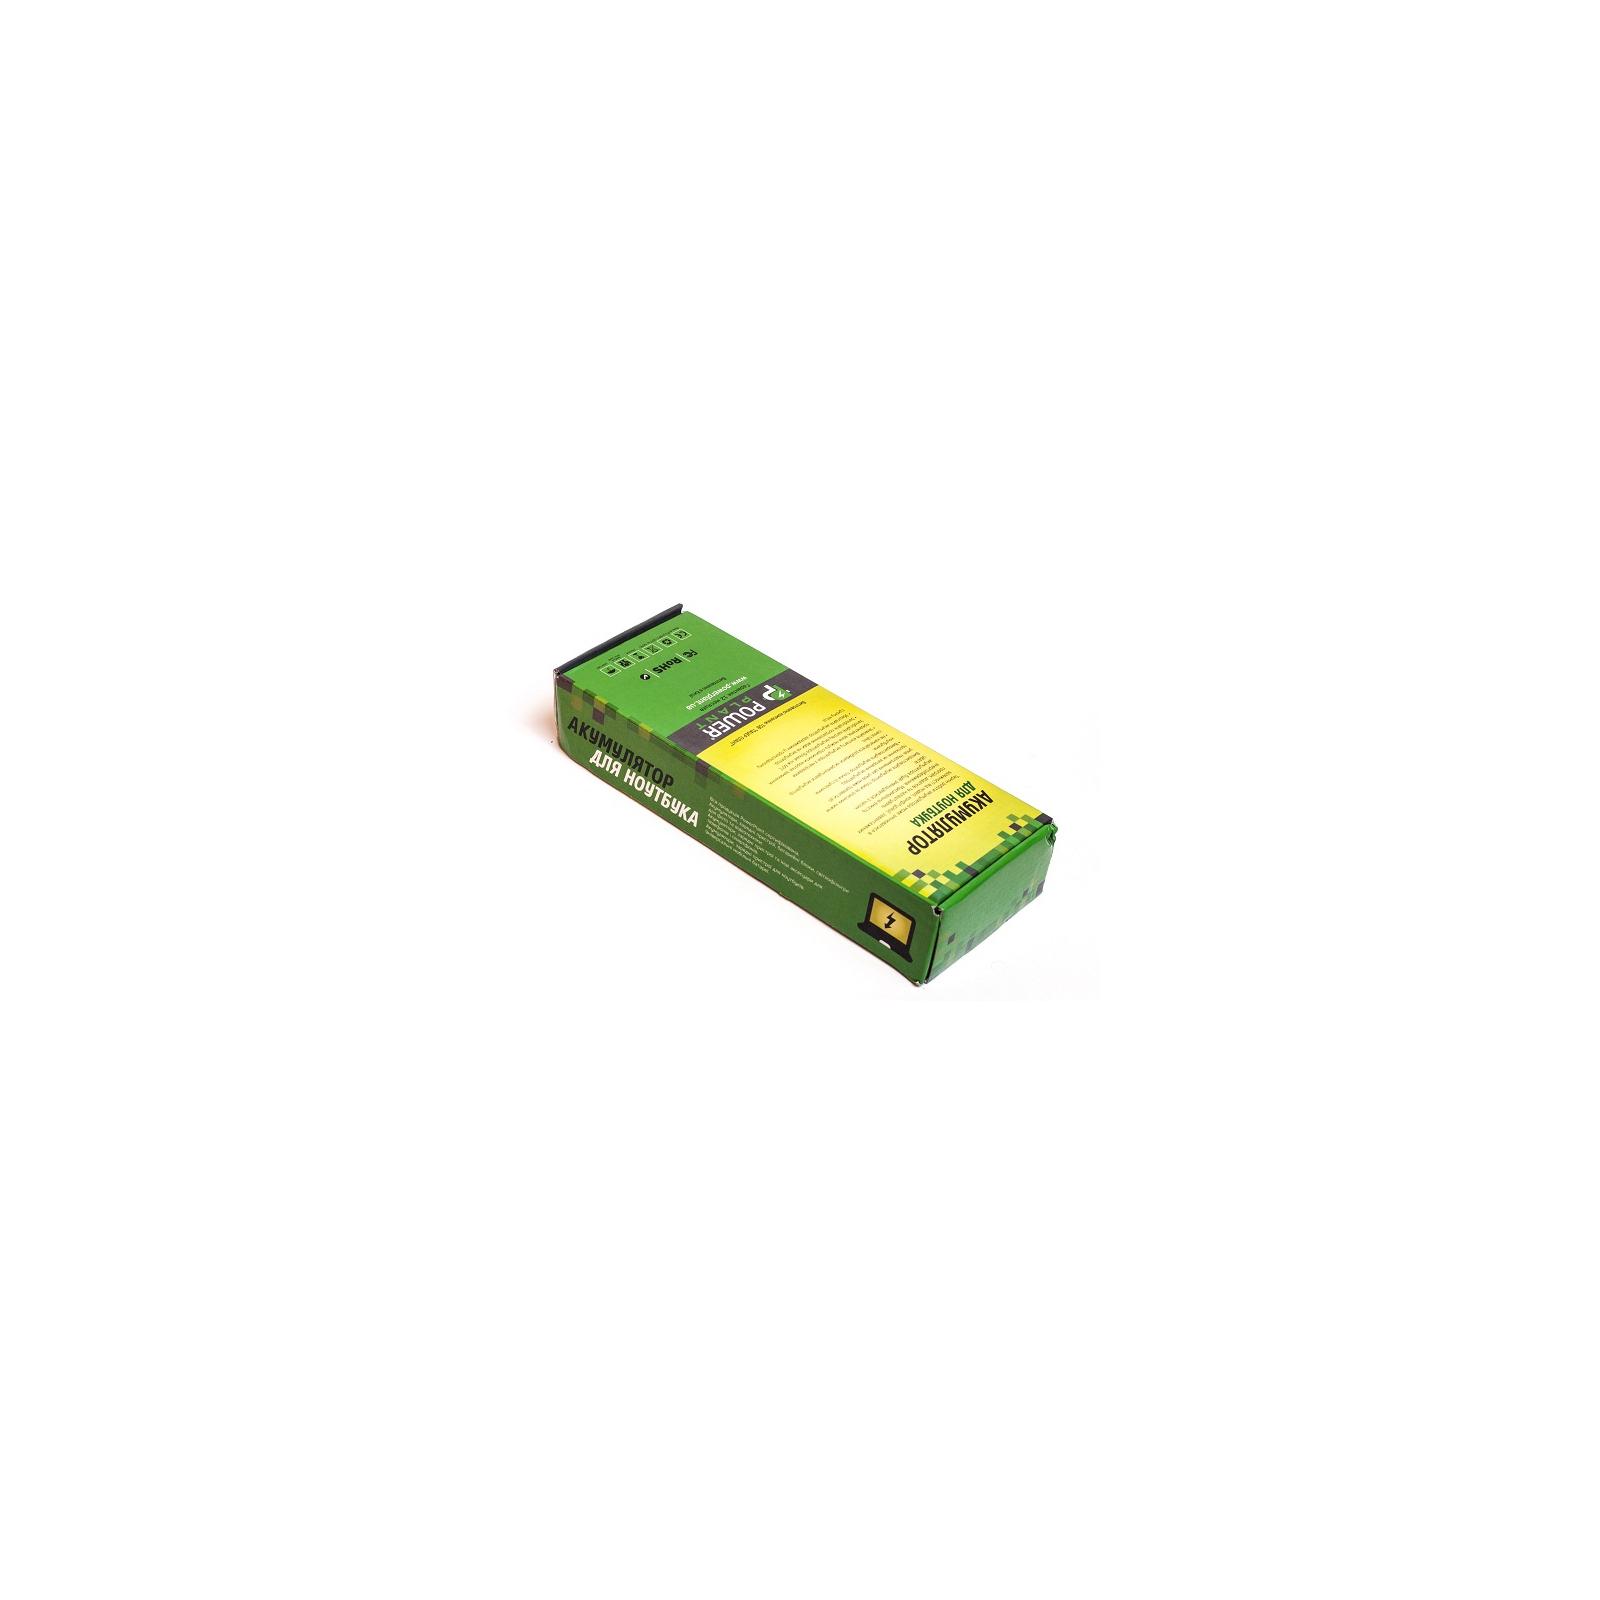 Аккумулятор для ноутбука ASUS K45 (A32-K55 AS-K55-6) 10.8V 5200mAh PowerPlant (NB00000172) изображение 2